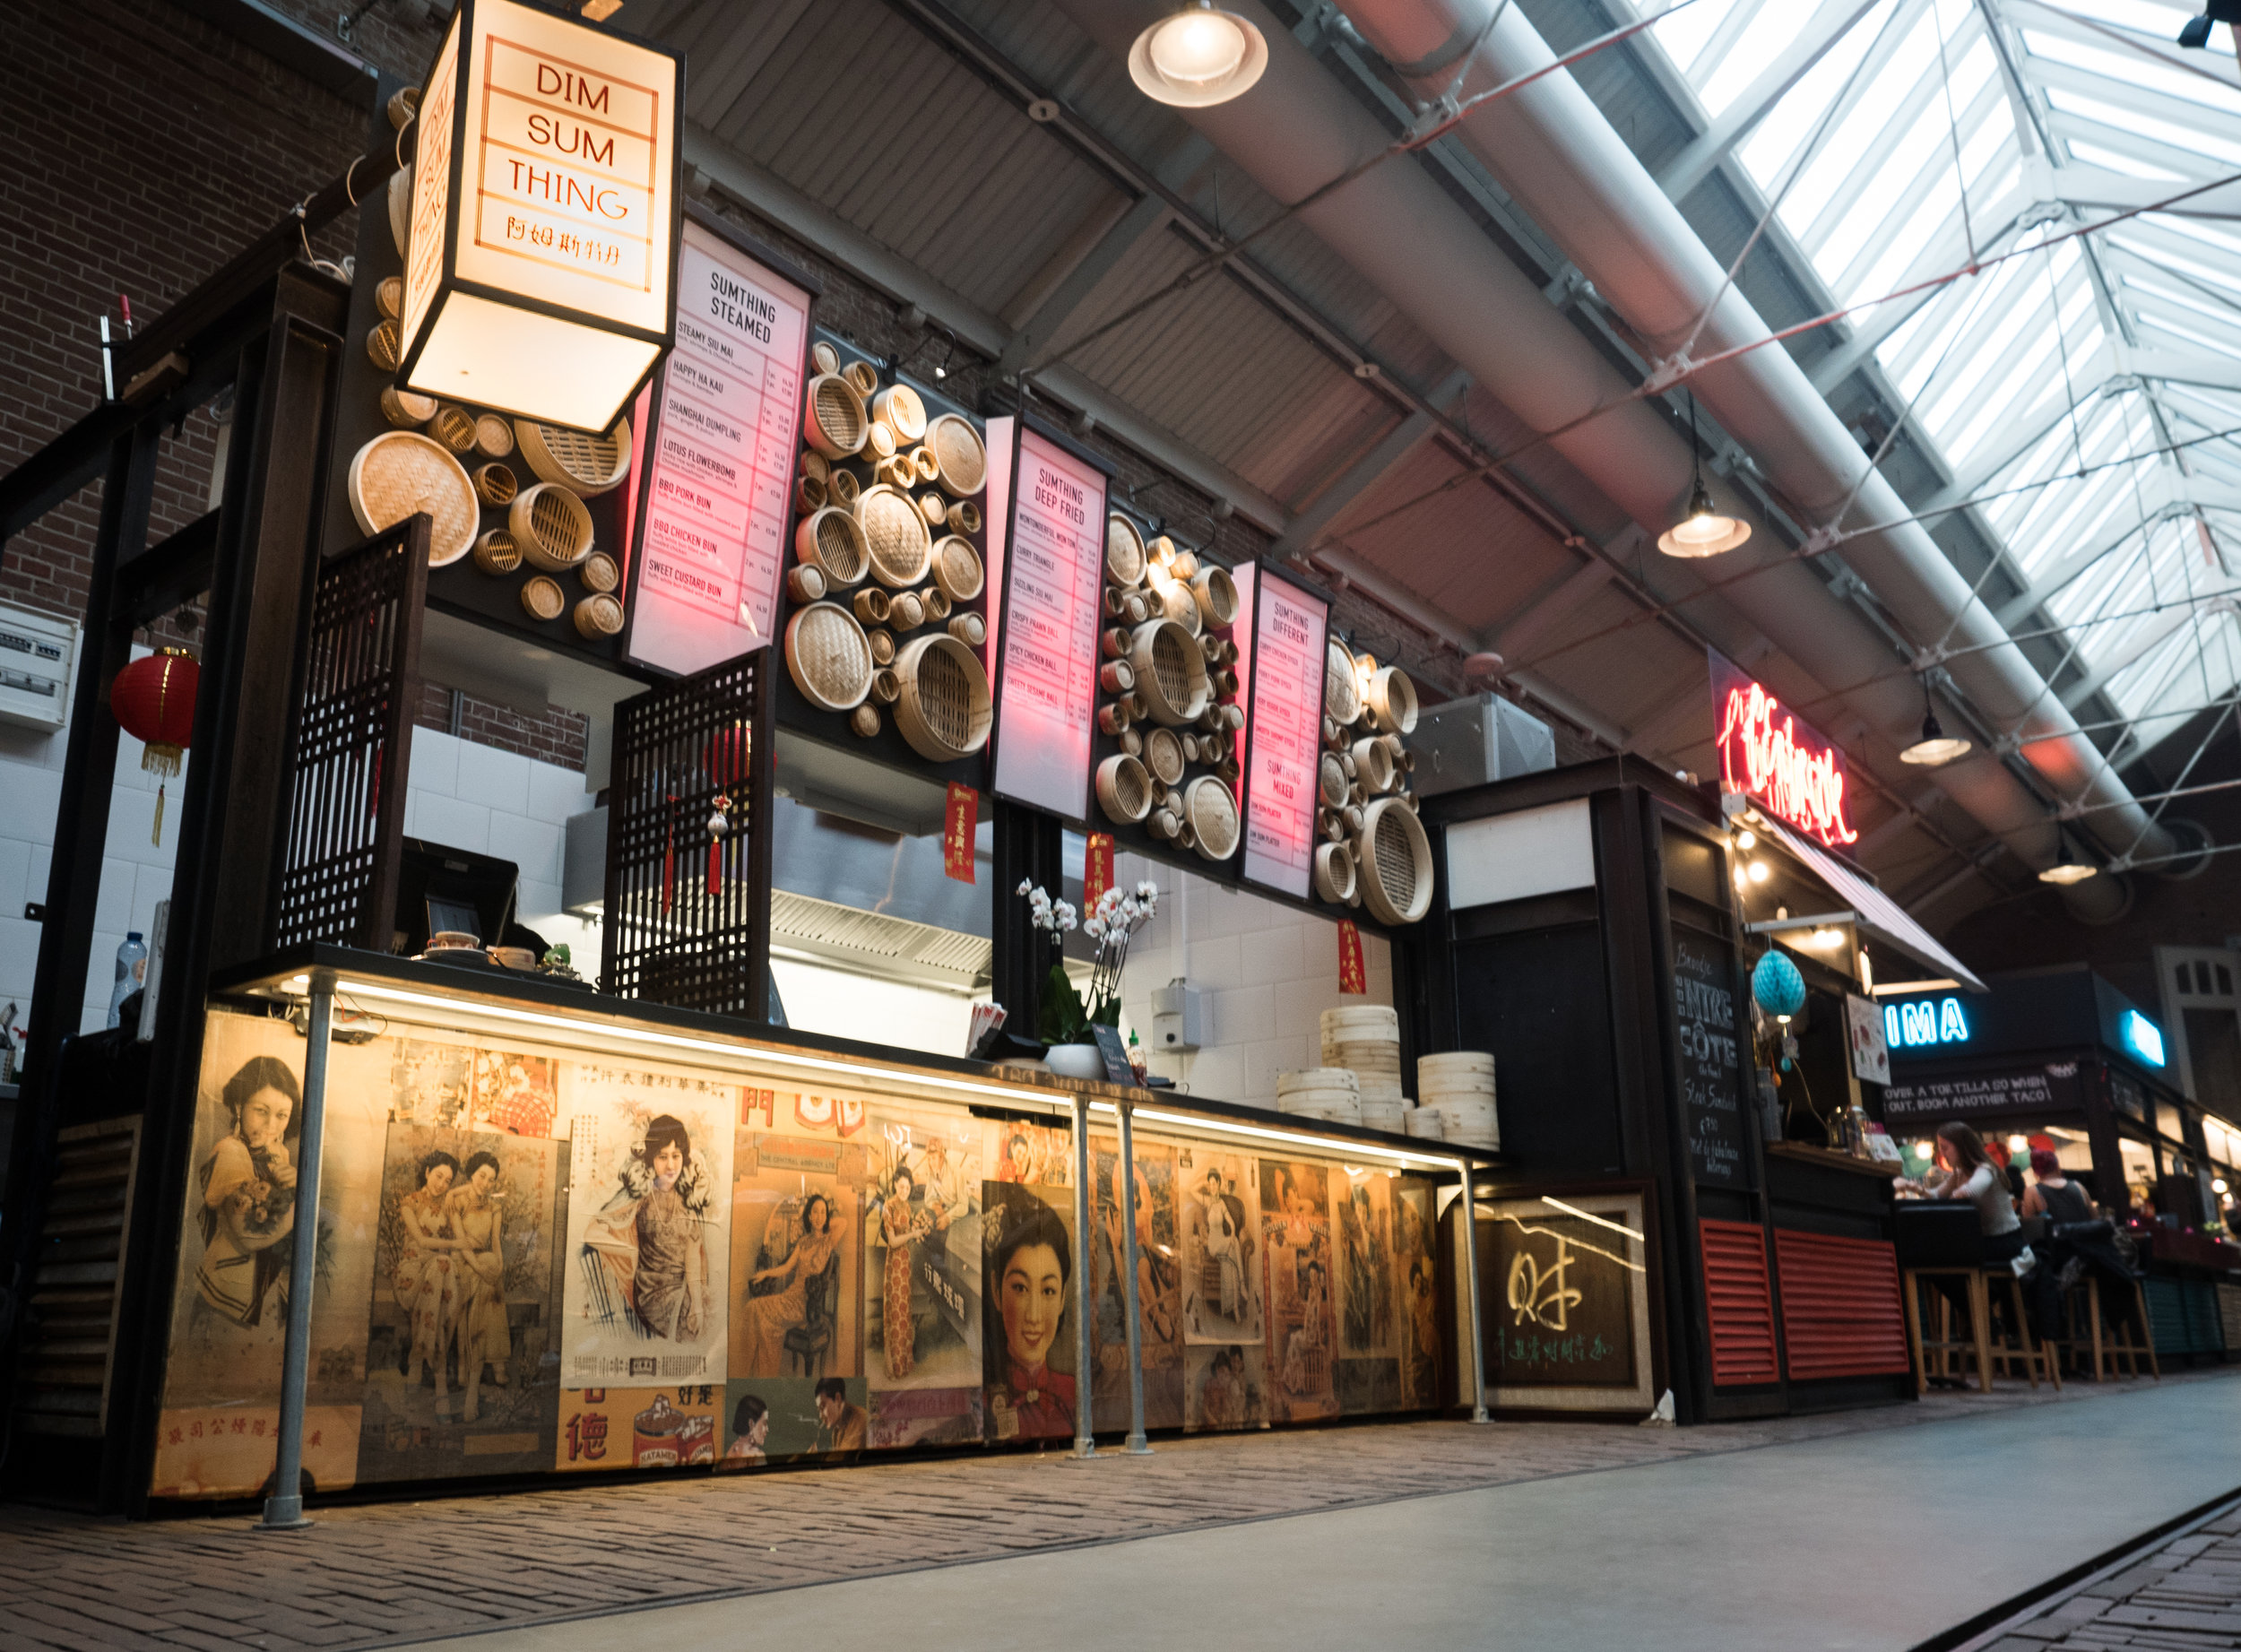 Dim sum thing- Foodhallen - amsterdam